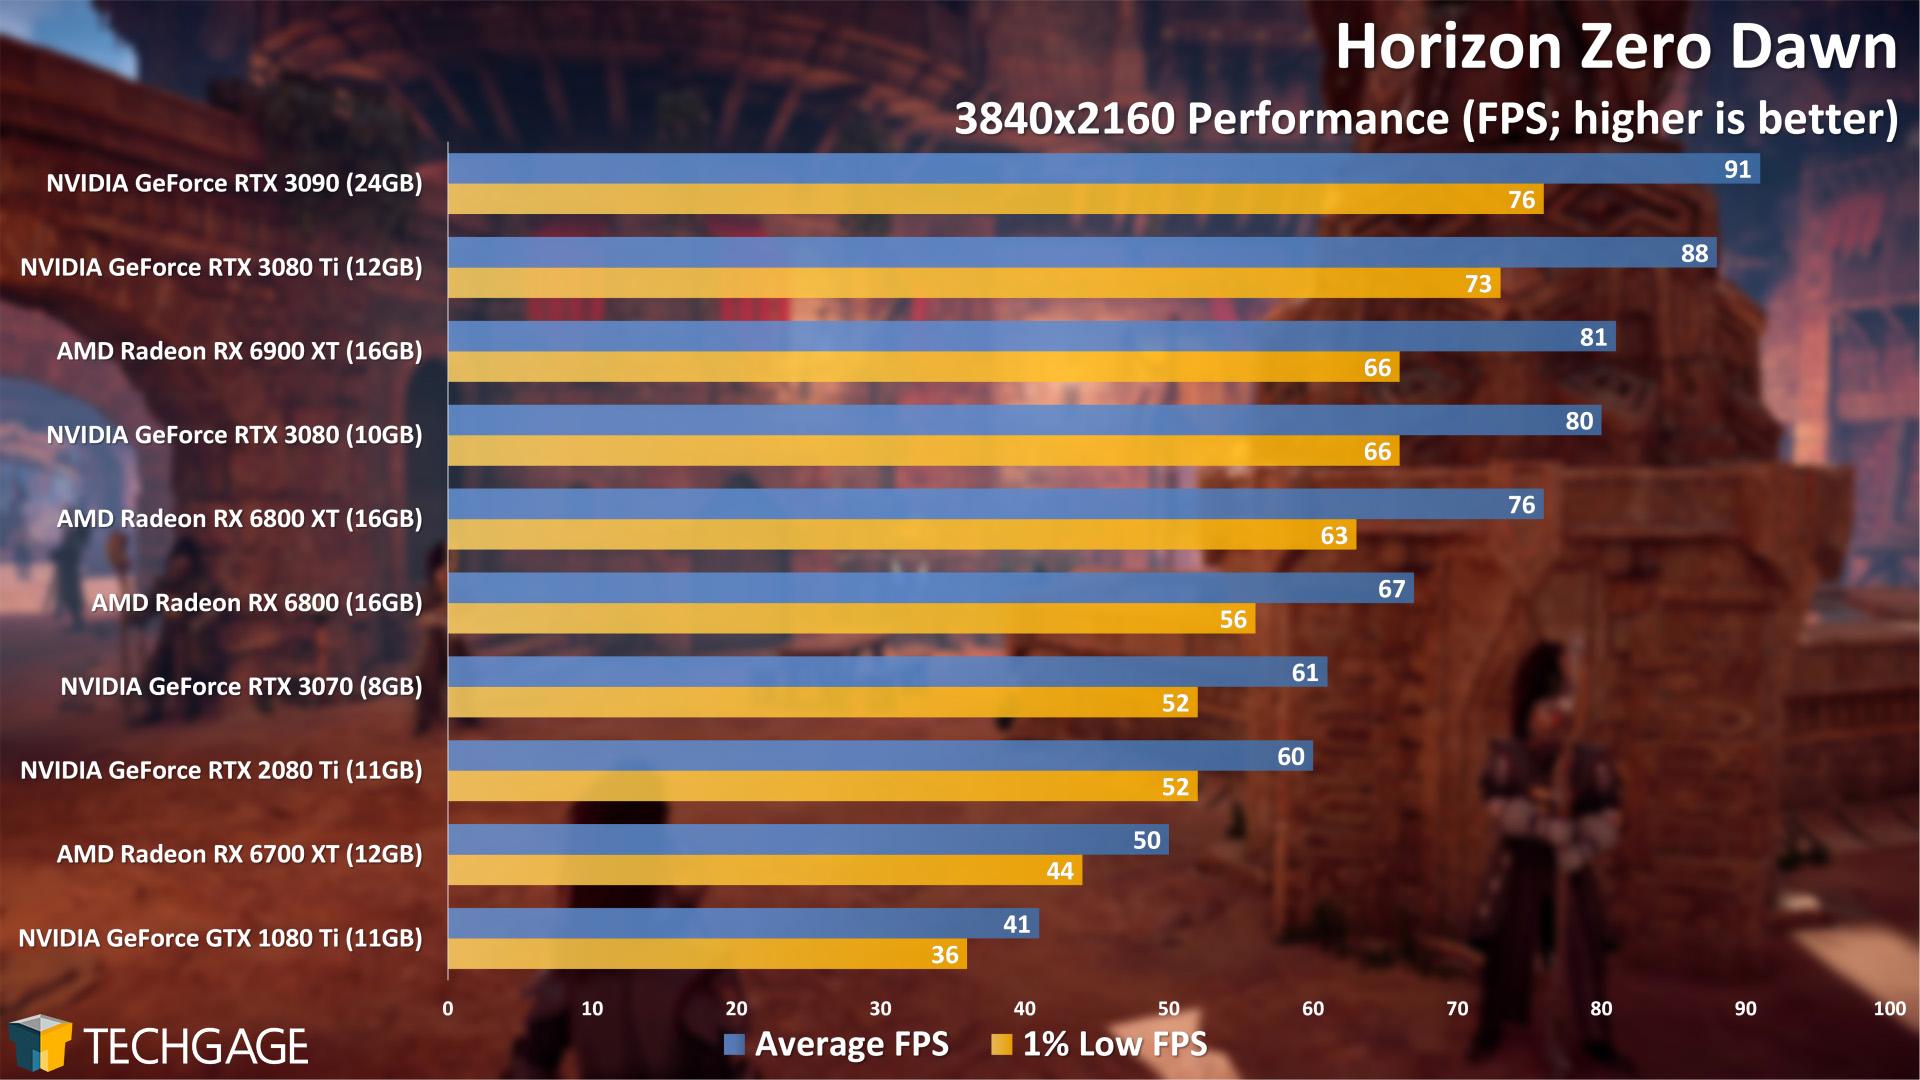 Horizon Zero Dawn - 2160p Performance (NVIDIA GeForce RTX 3080 Ti)